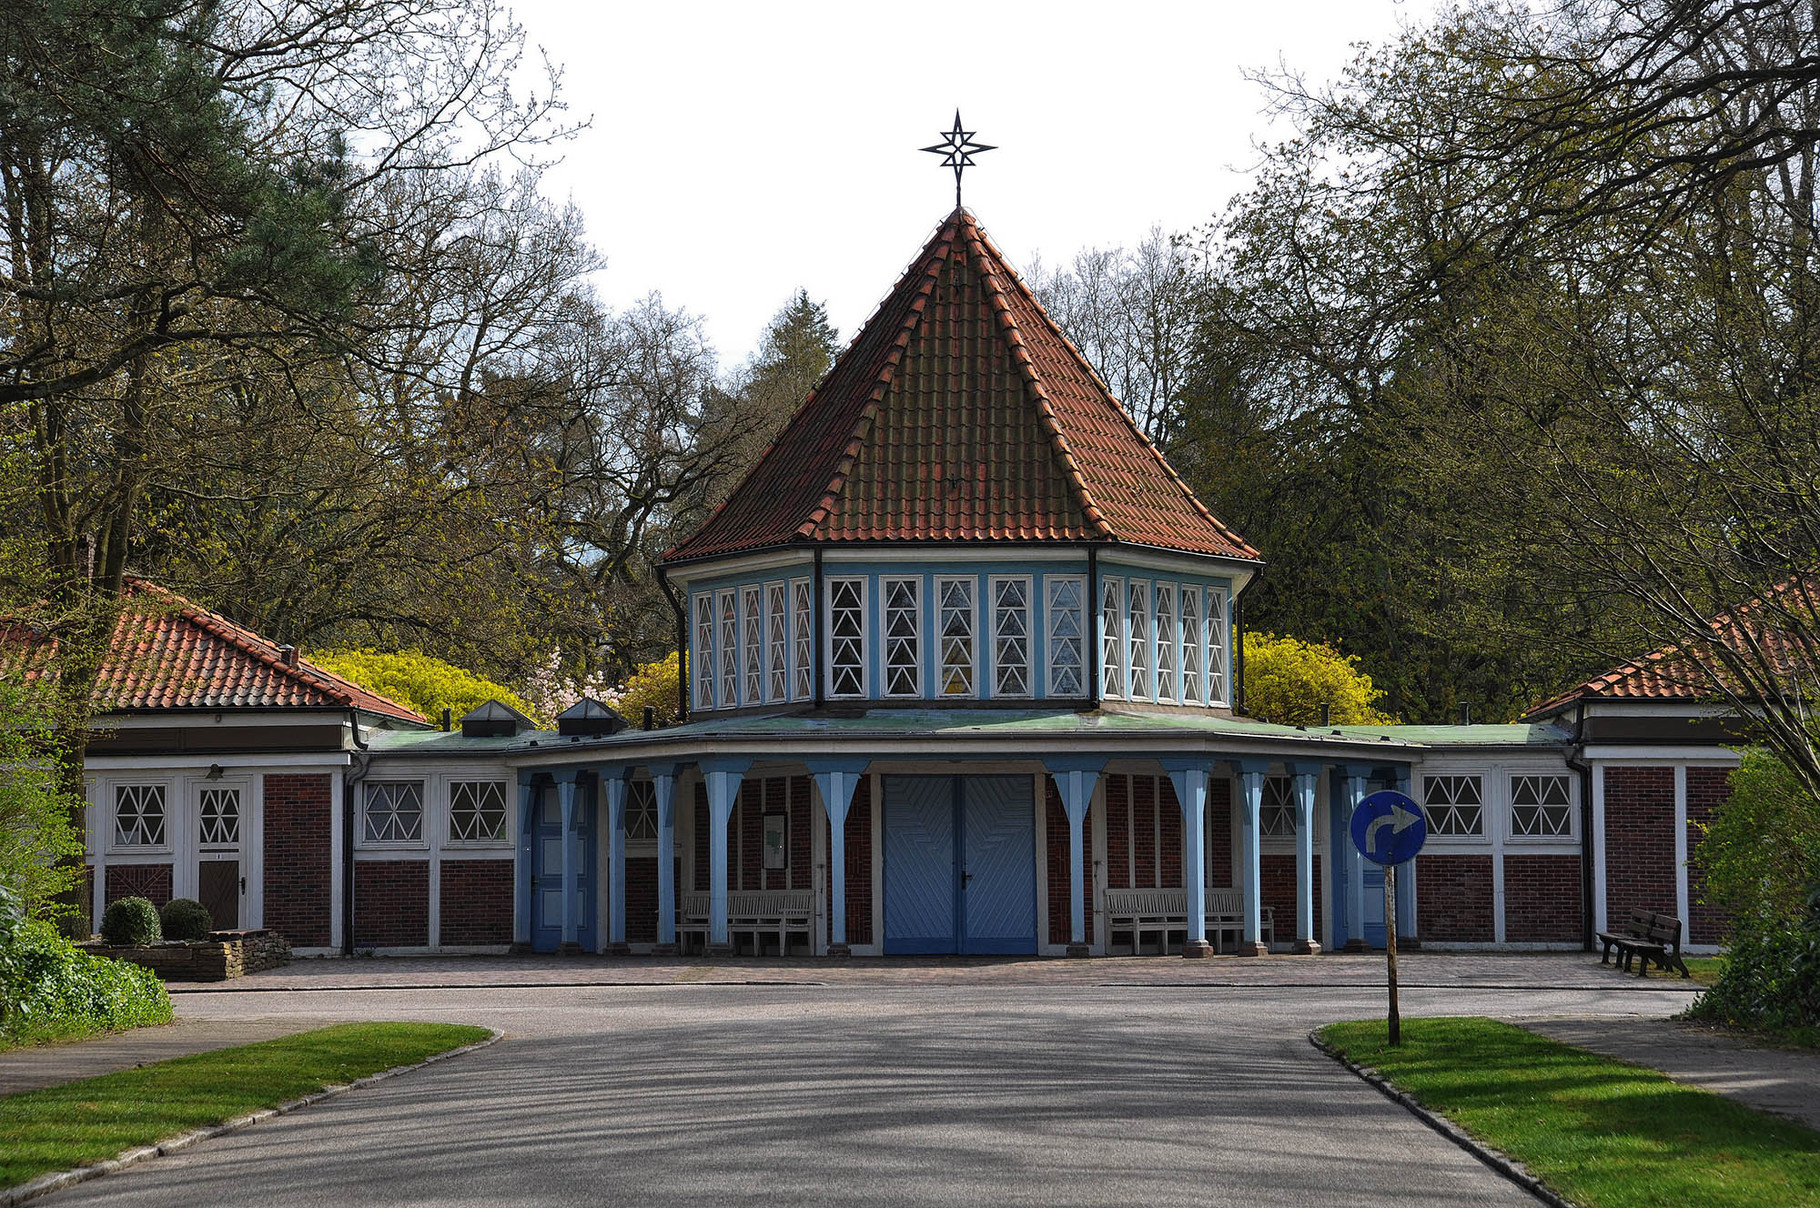 Friedhof Ohlsdorf, der größte Parkfriedhof der Welt, Kapelle 10